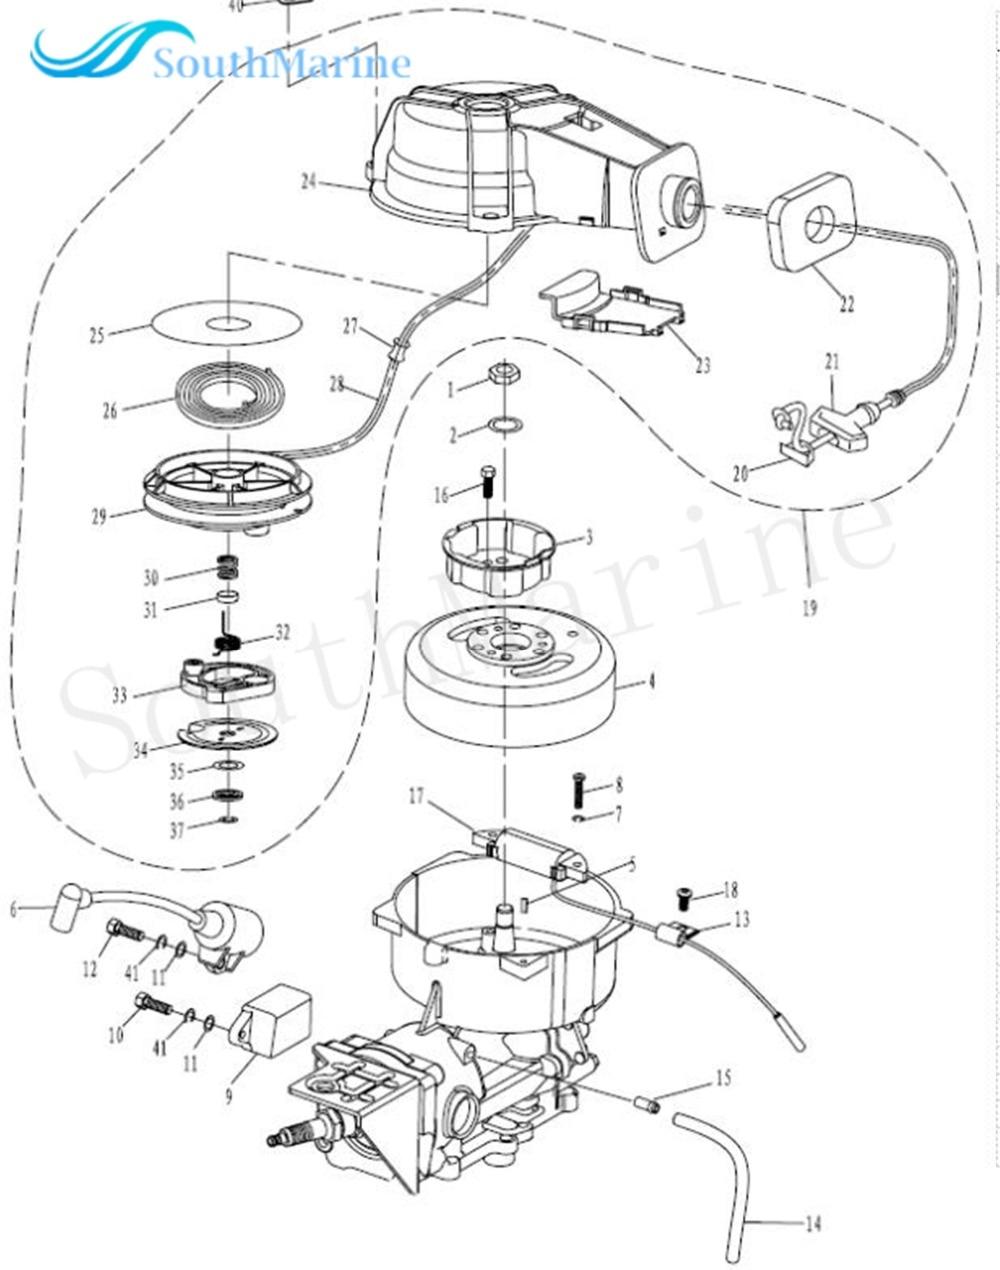 2 Stroke Coil Diagram Wiring Diagram Home